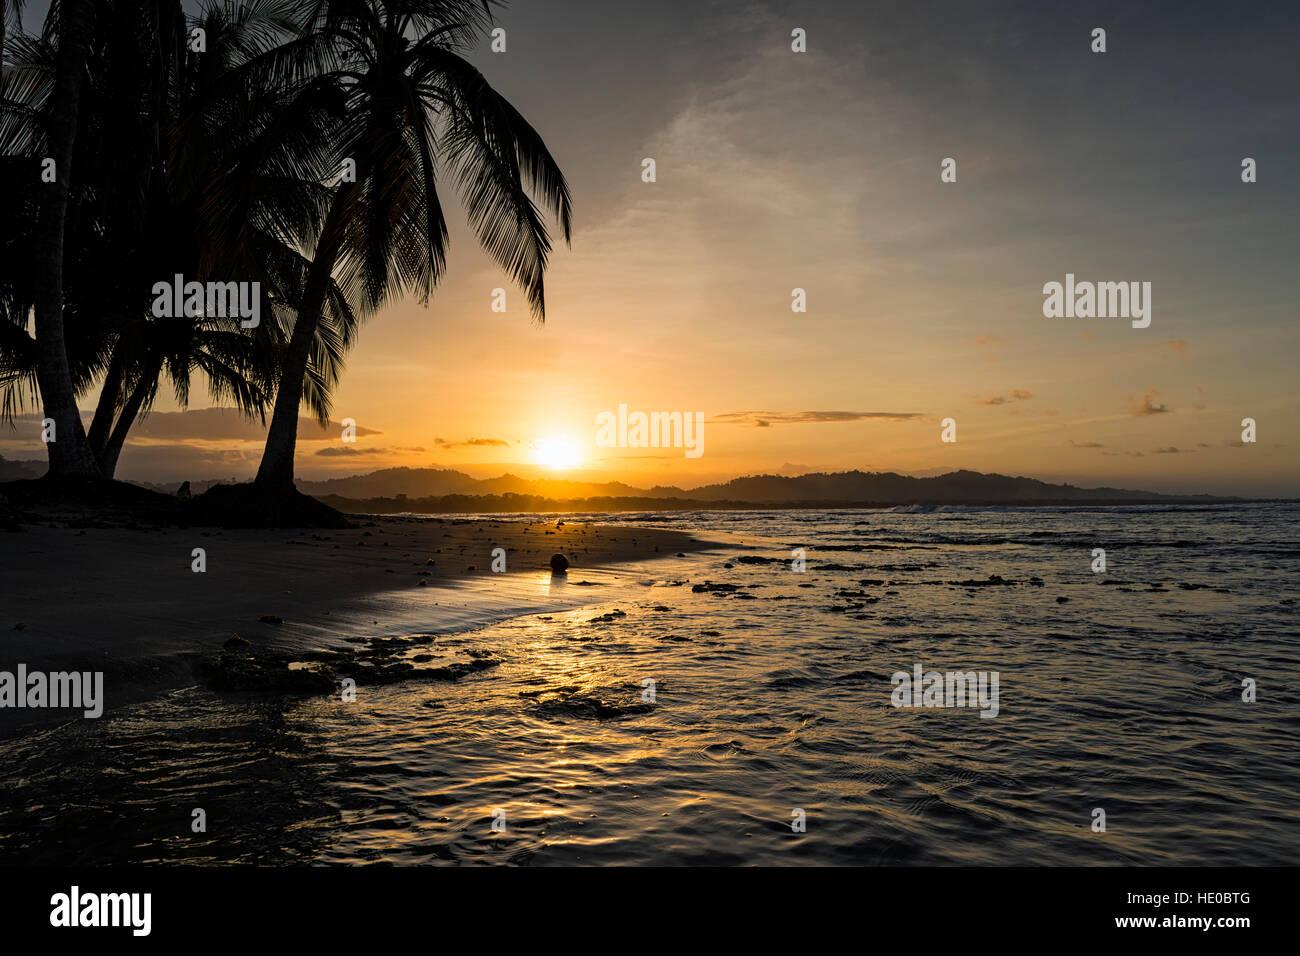 Blick auf einen Strand mit Palmen bei Sonnenuntergang in Puerto Viejo de Talamanca, Costa Rica, Zentralamerika; Stockbild